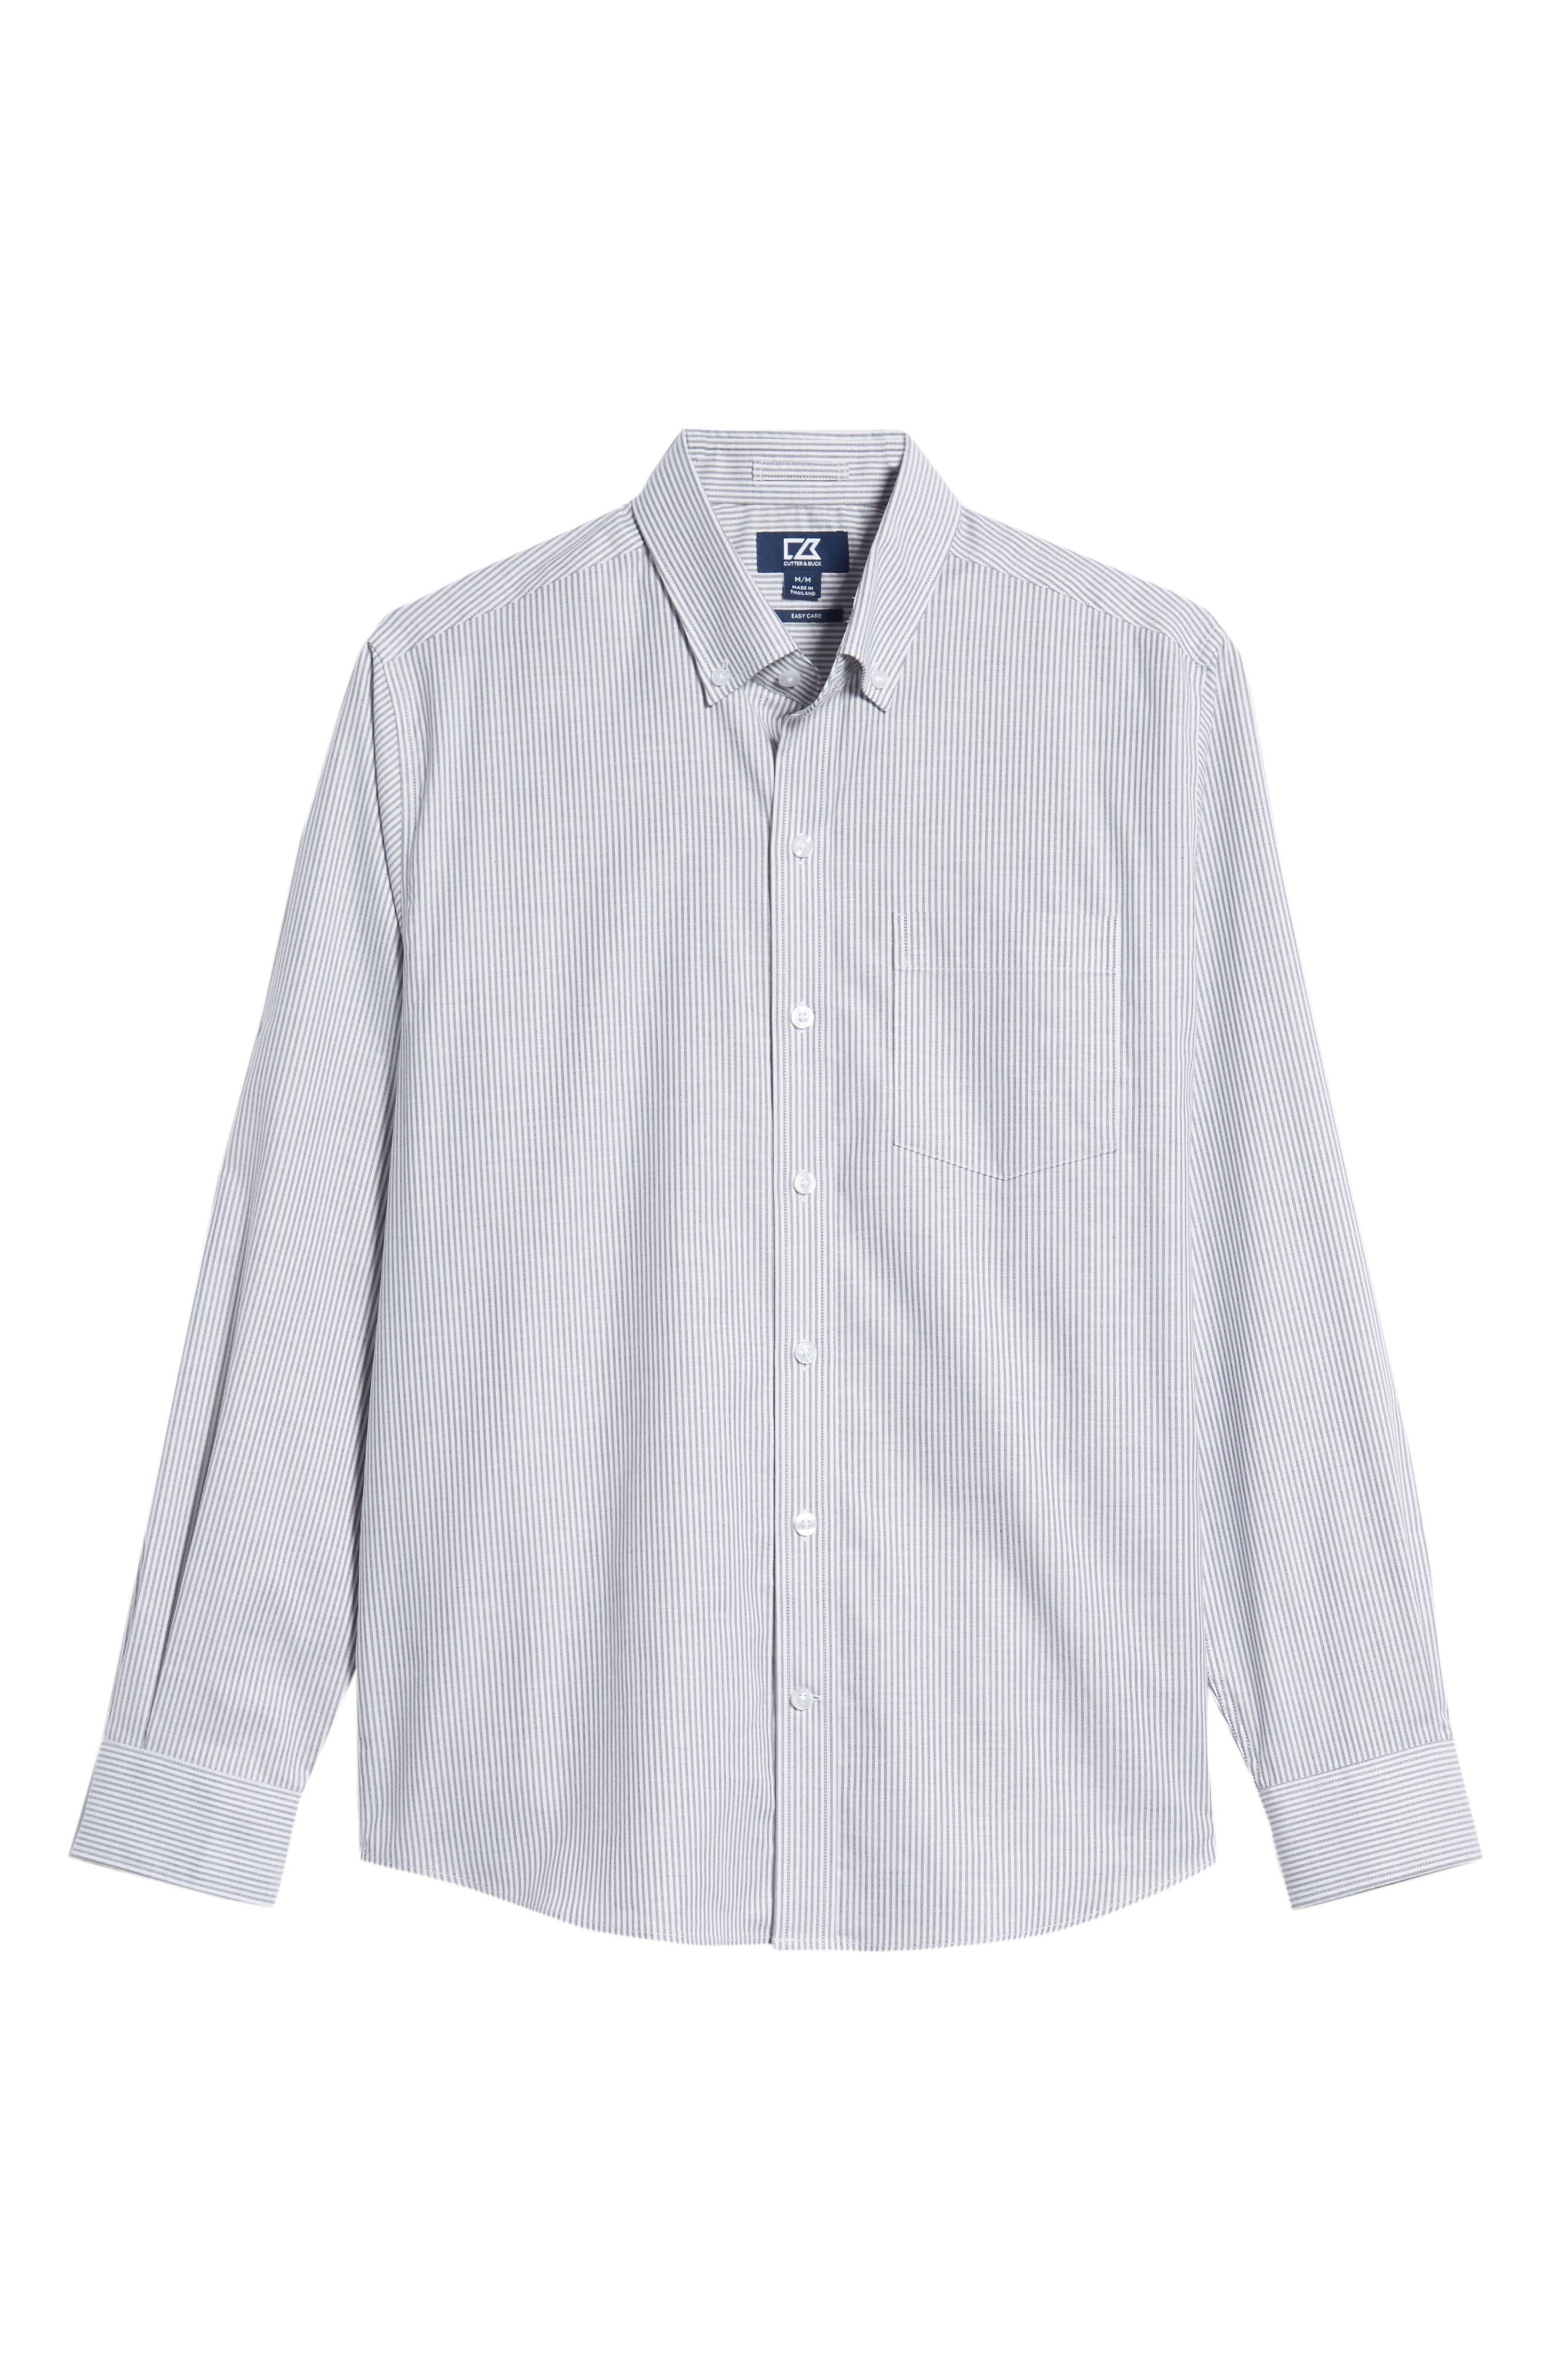 Regular Fit Stripe Stretch Oxford Shirt,                             Alternate thumbnail 5, color,                             CHARCOAL